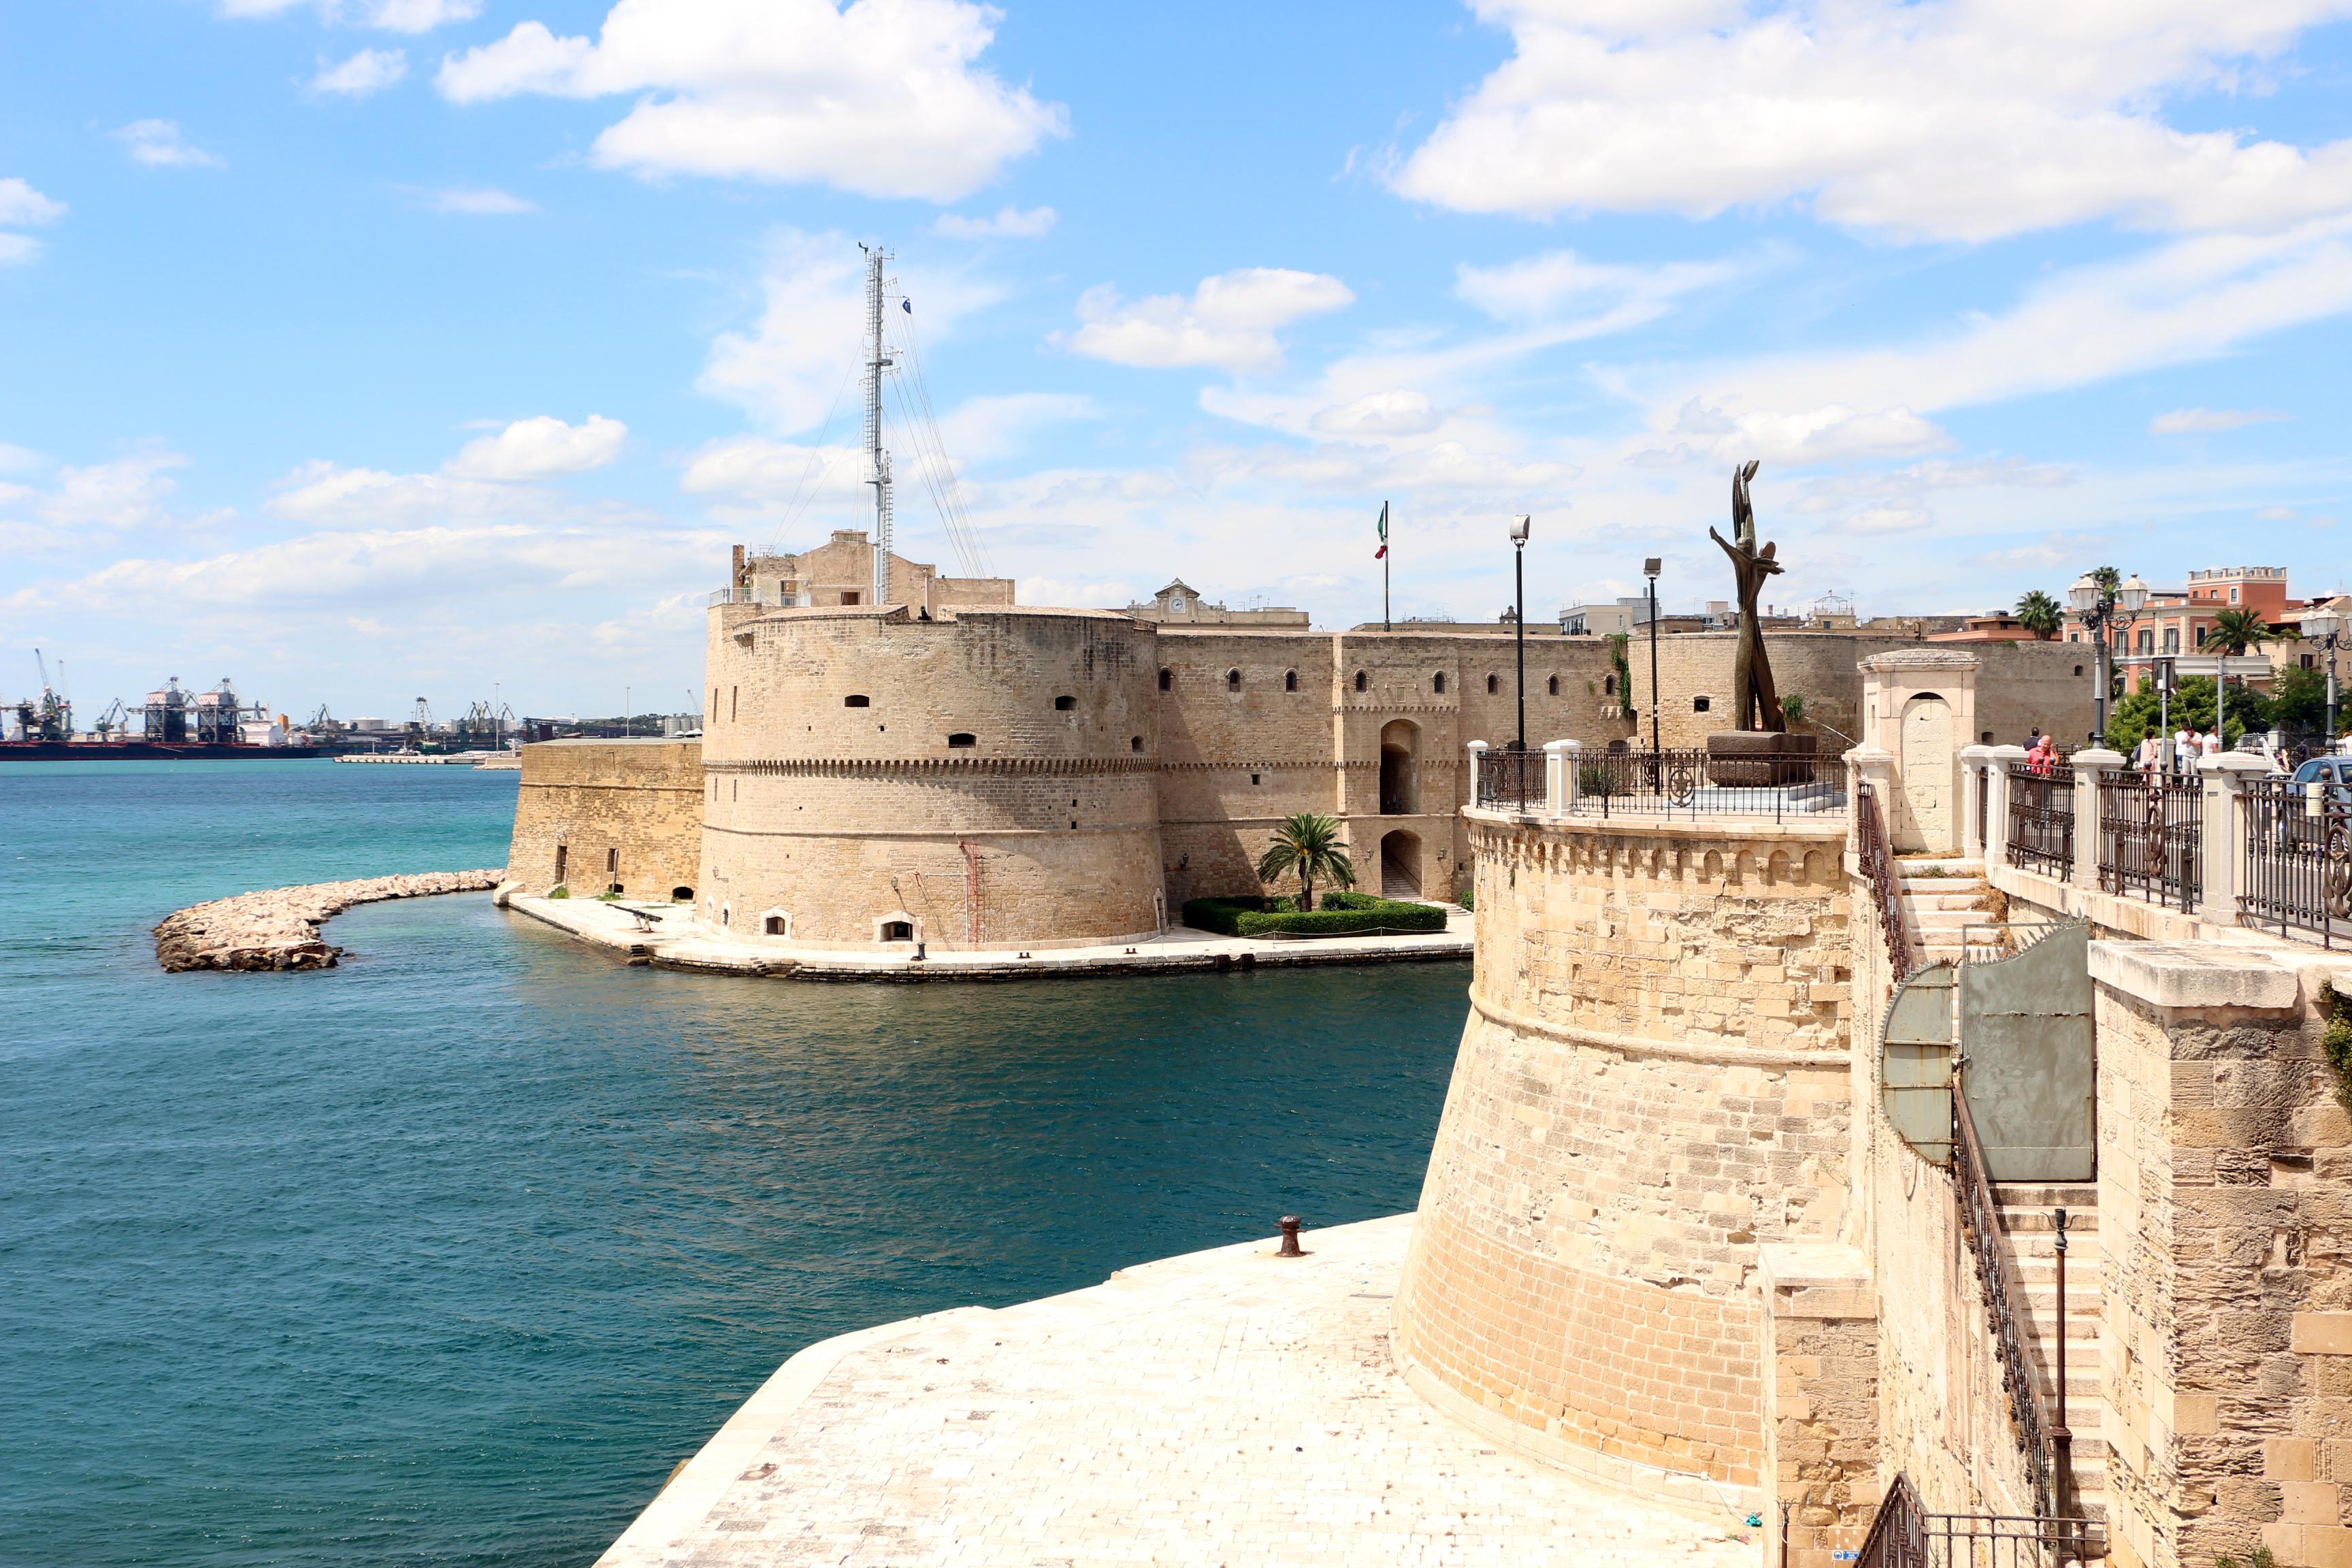 Noleggio Barche Taranto - Navalia | Noleggia un Sogno